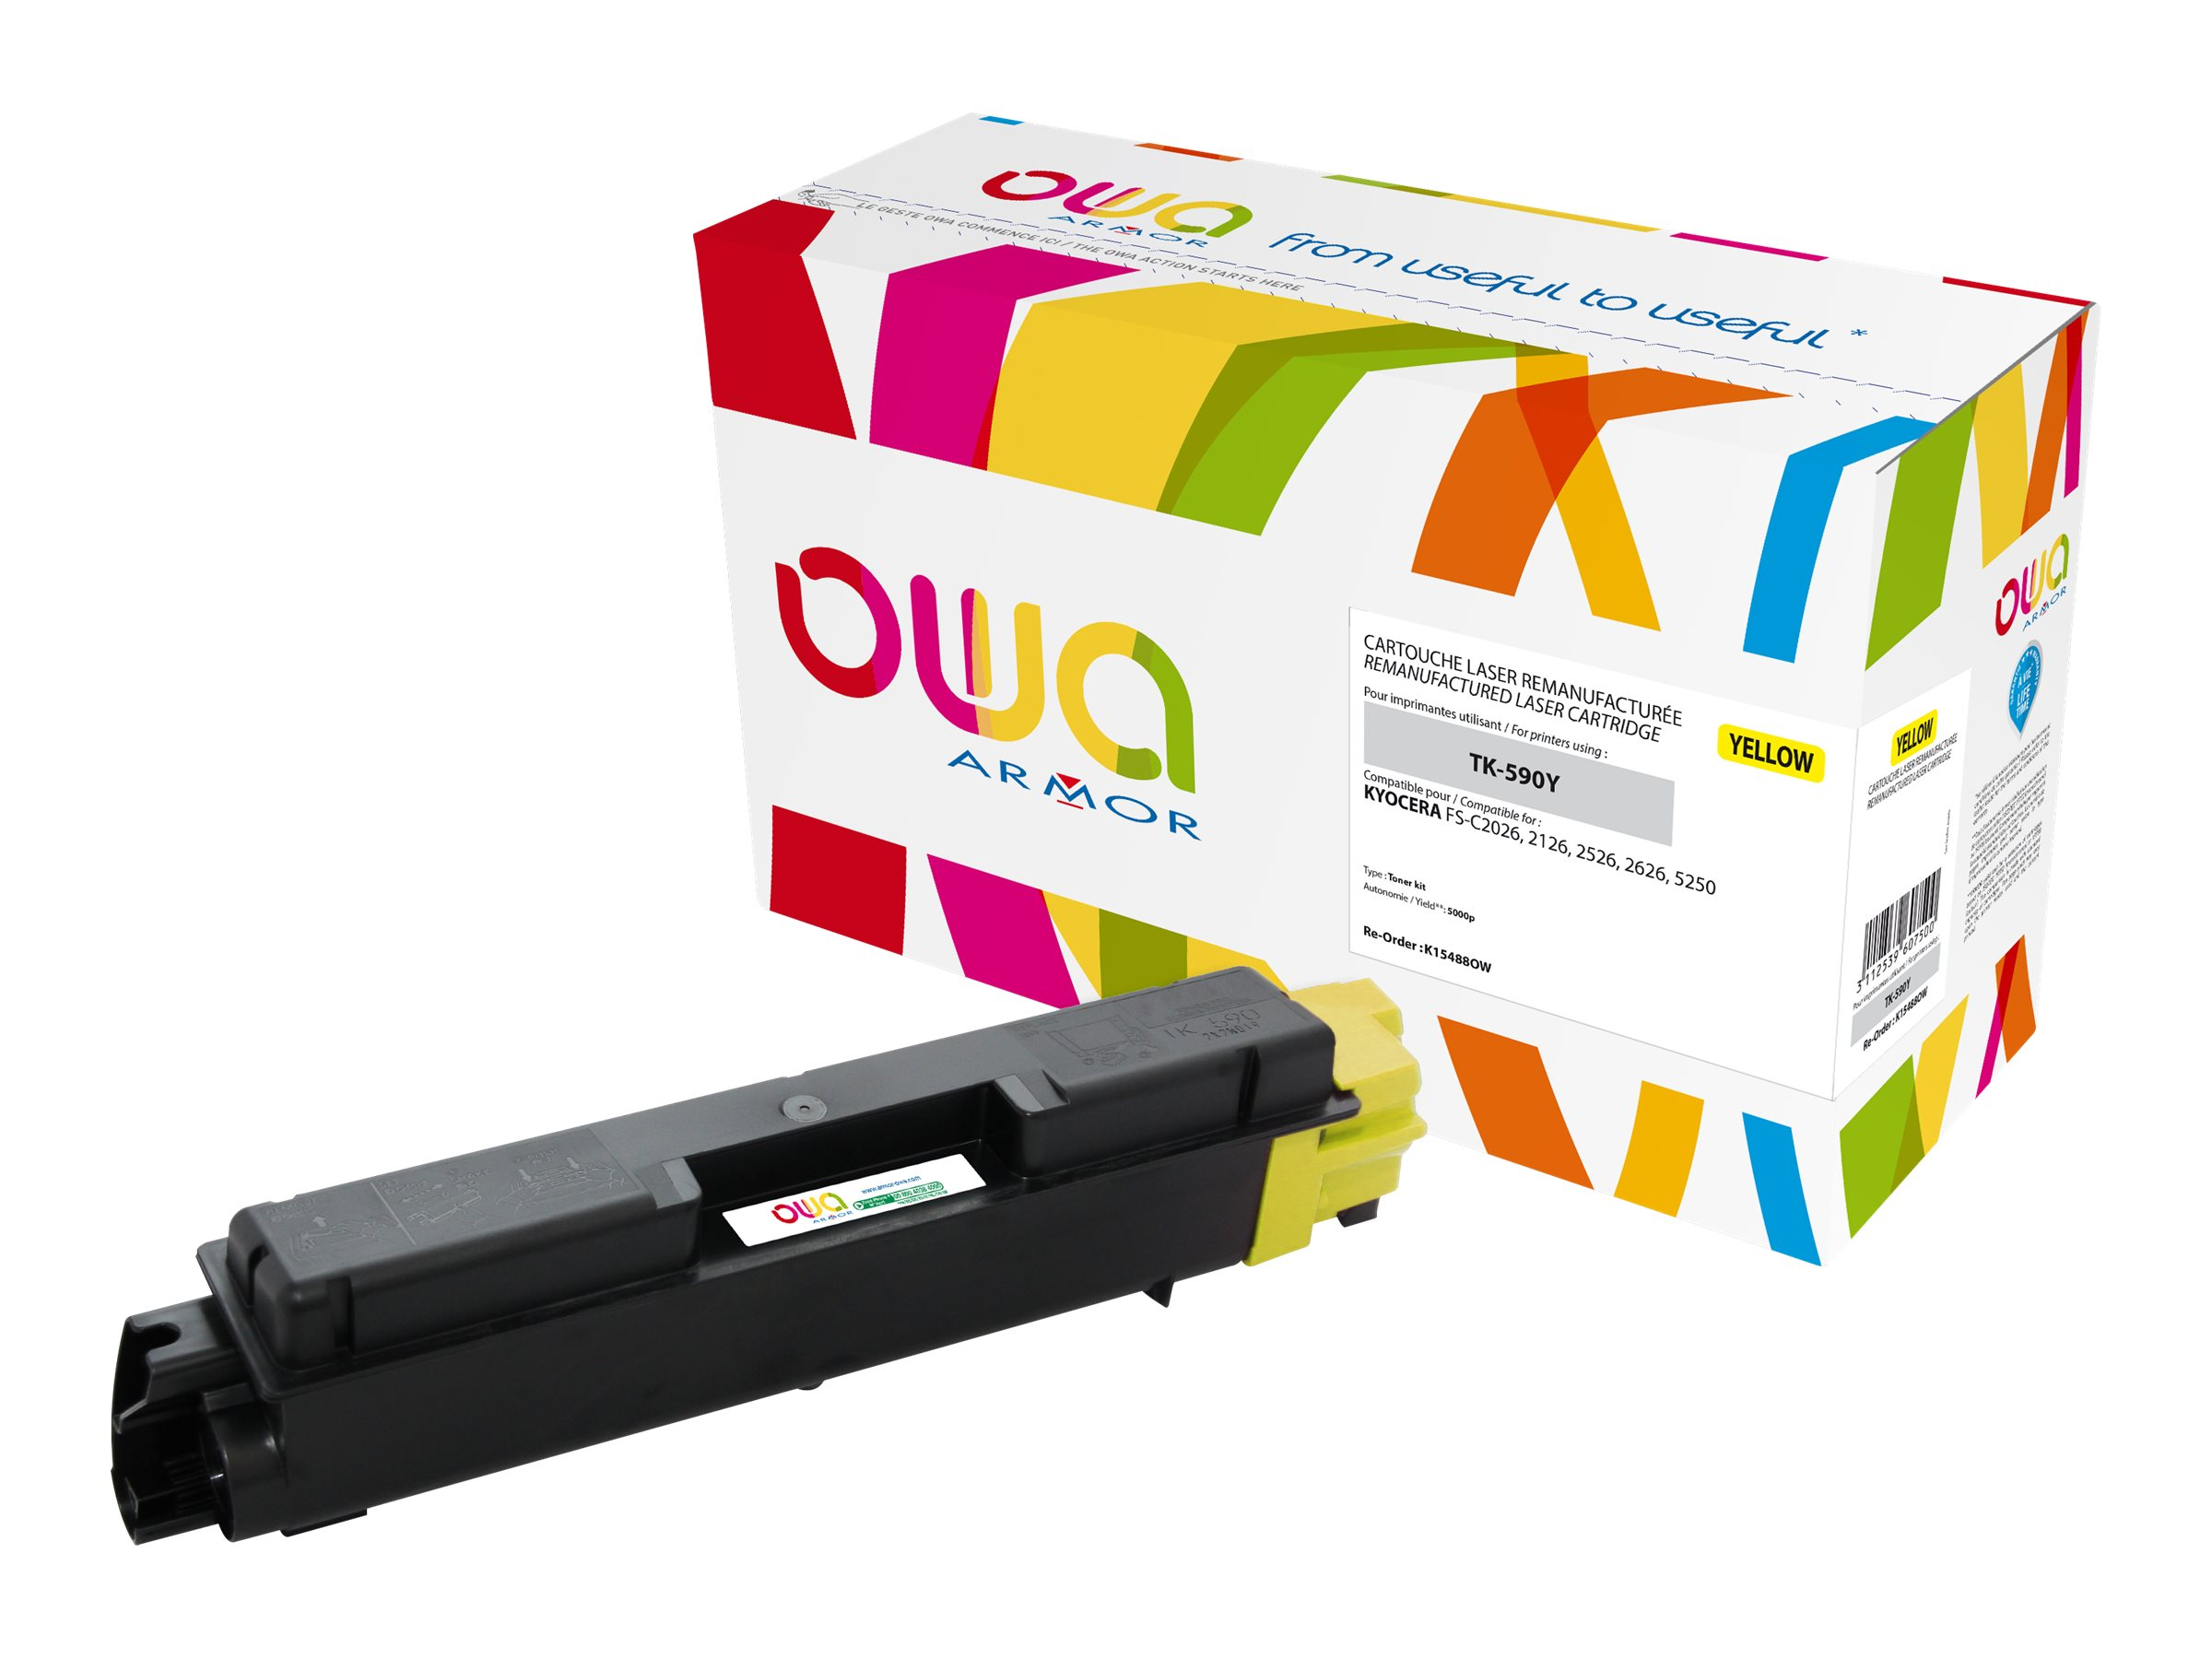 Kyocera TK-590 - remanufacturé Owa K15488OW - jaune - cartouche laser